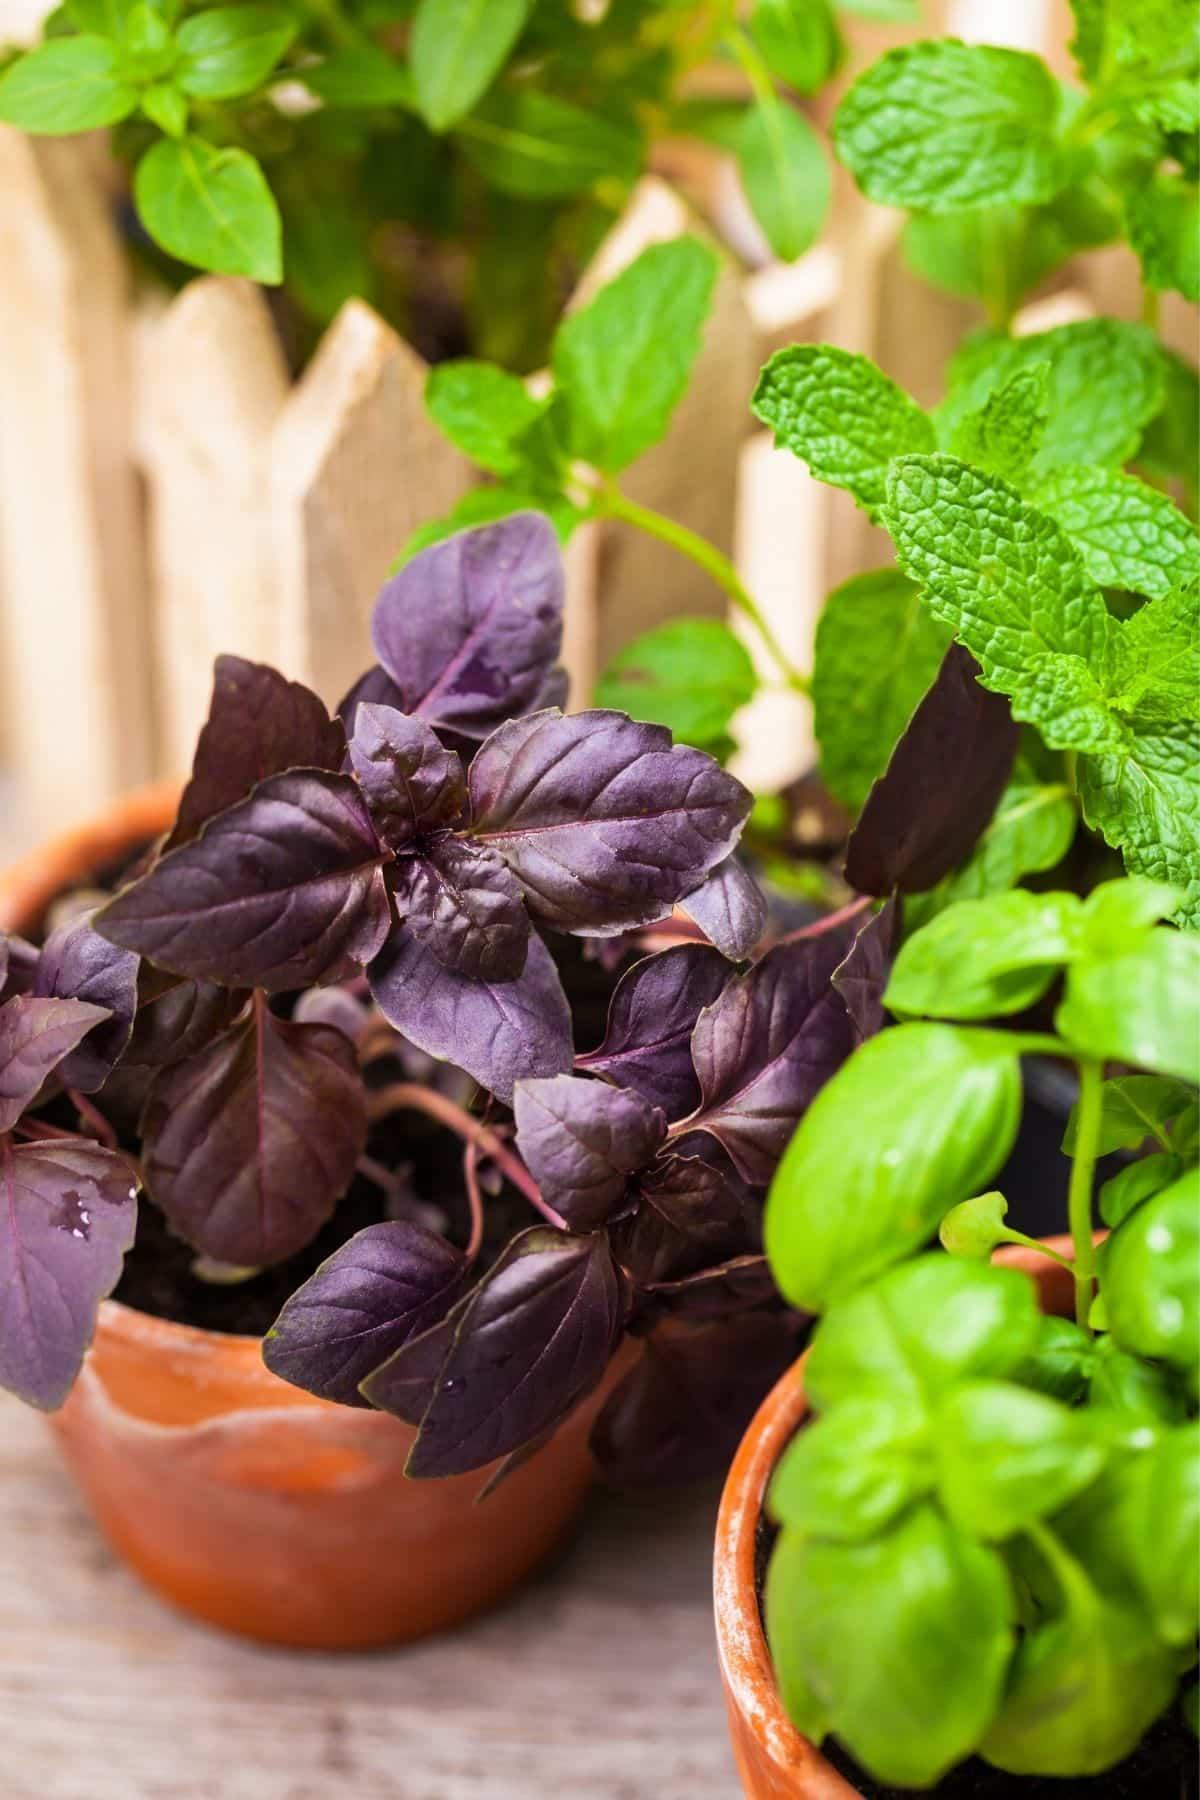 Purple basil and mint